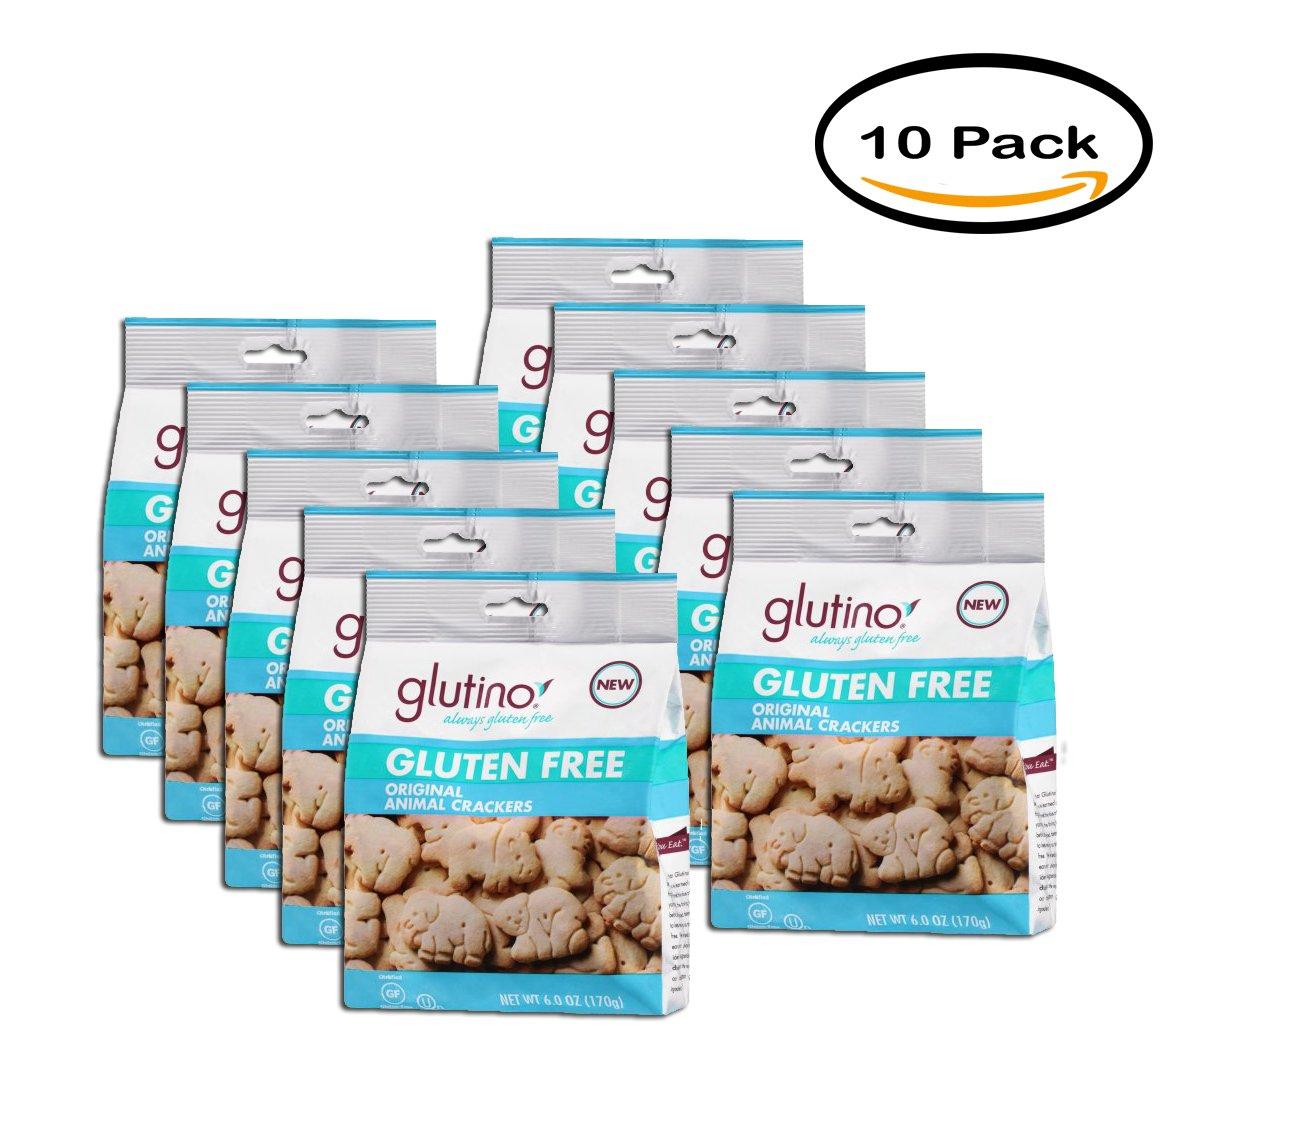 PACK OF 10 - Glutino Gluten Free Original Animal Crackers, 6 oz